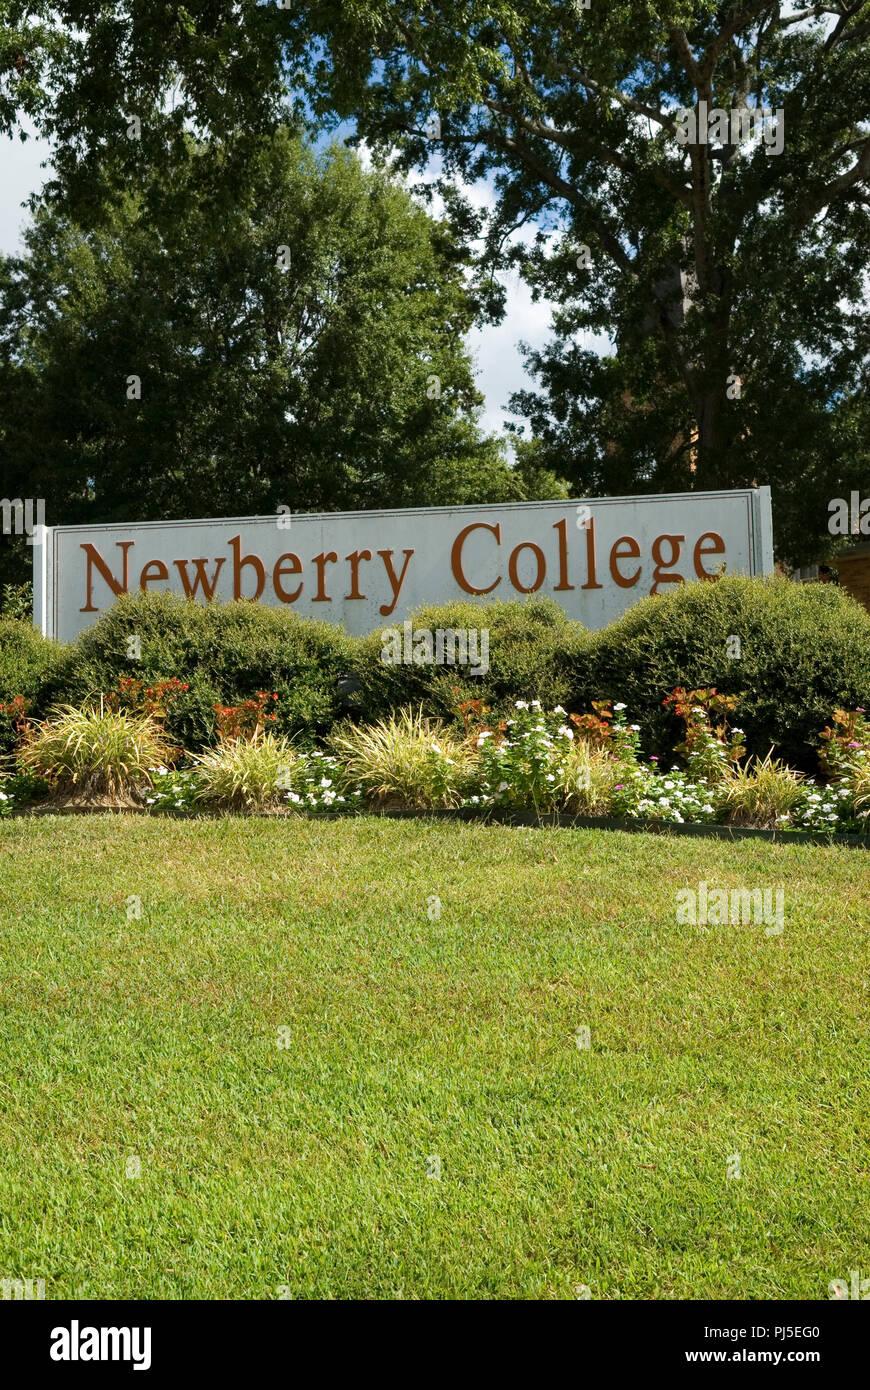 Newberry College South Carolina USA - Stock Image